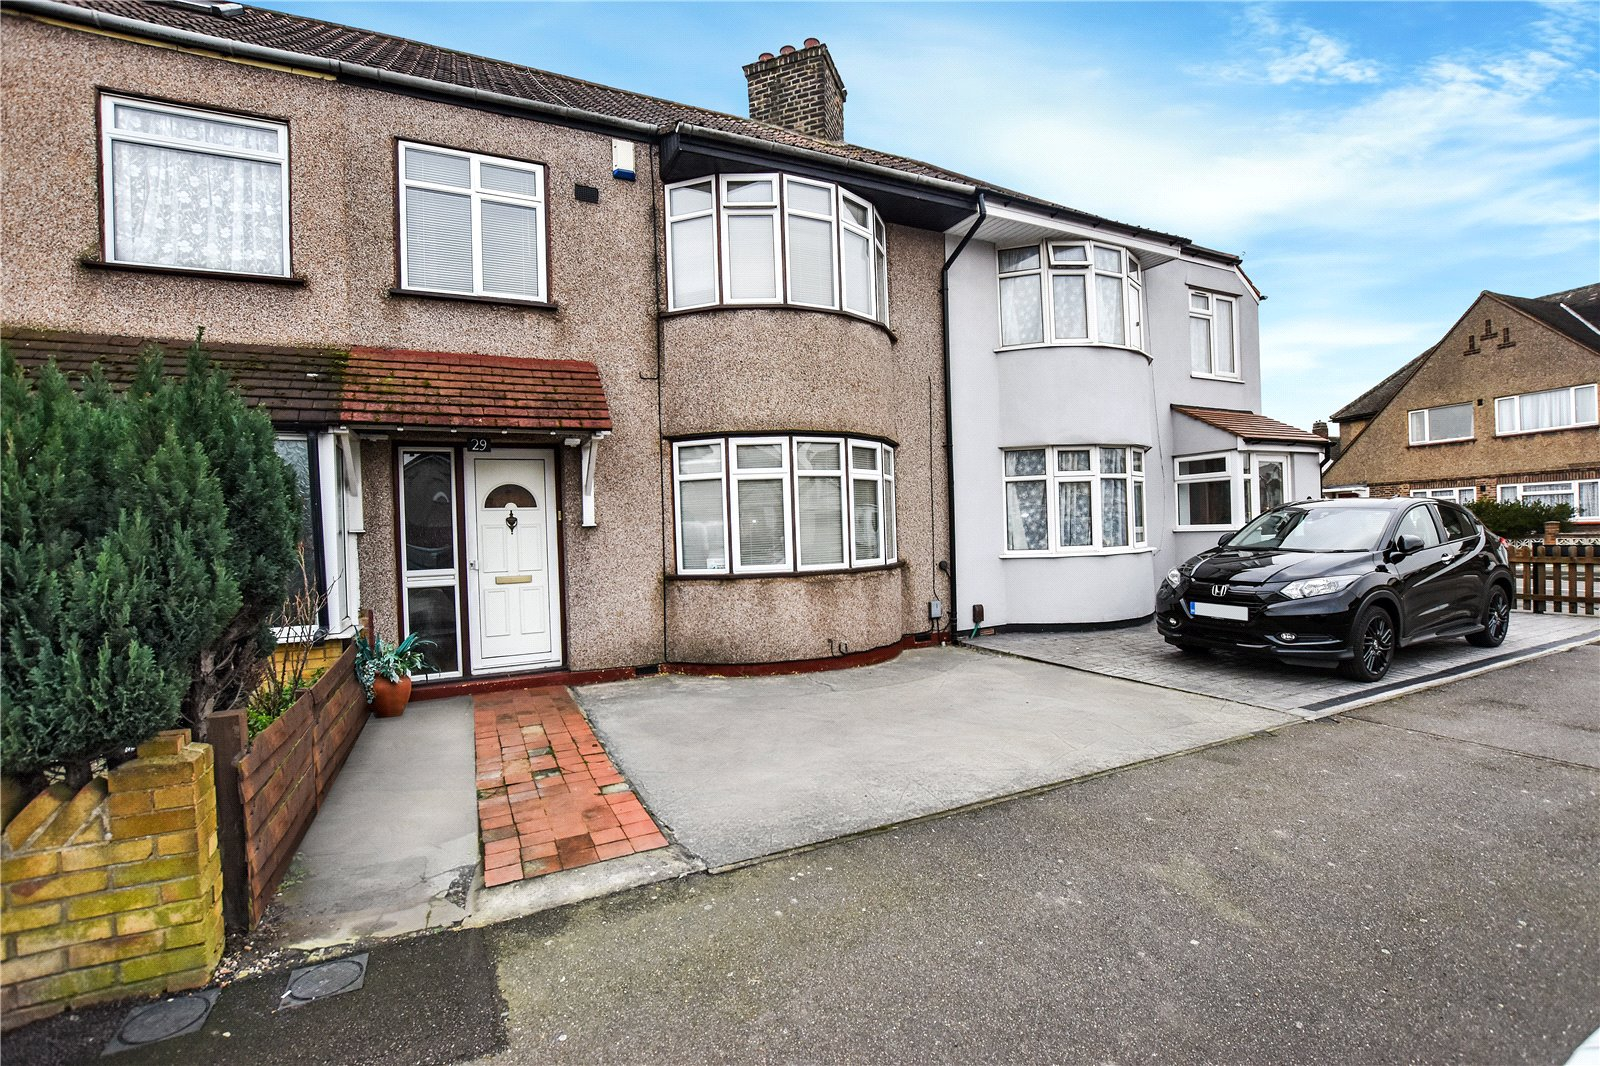 Herbert Road, Bexleyheath, Kent, DA7